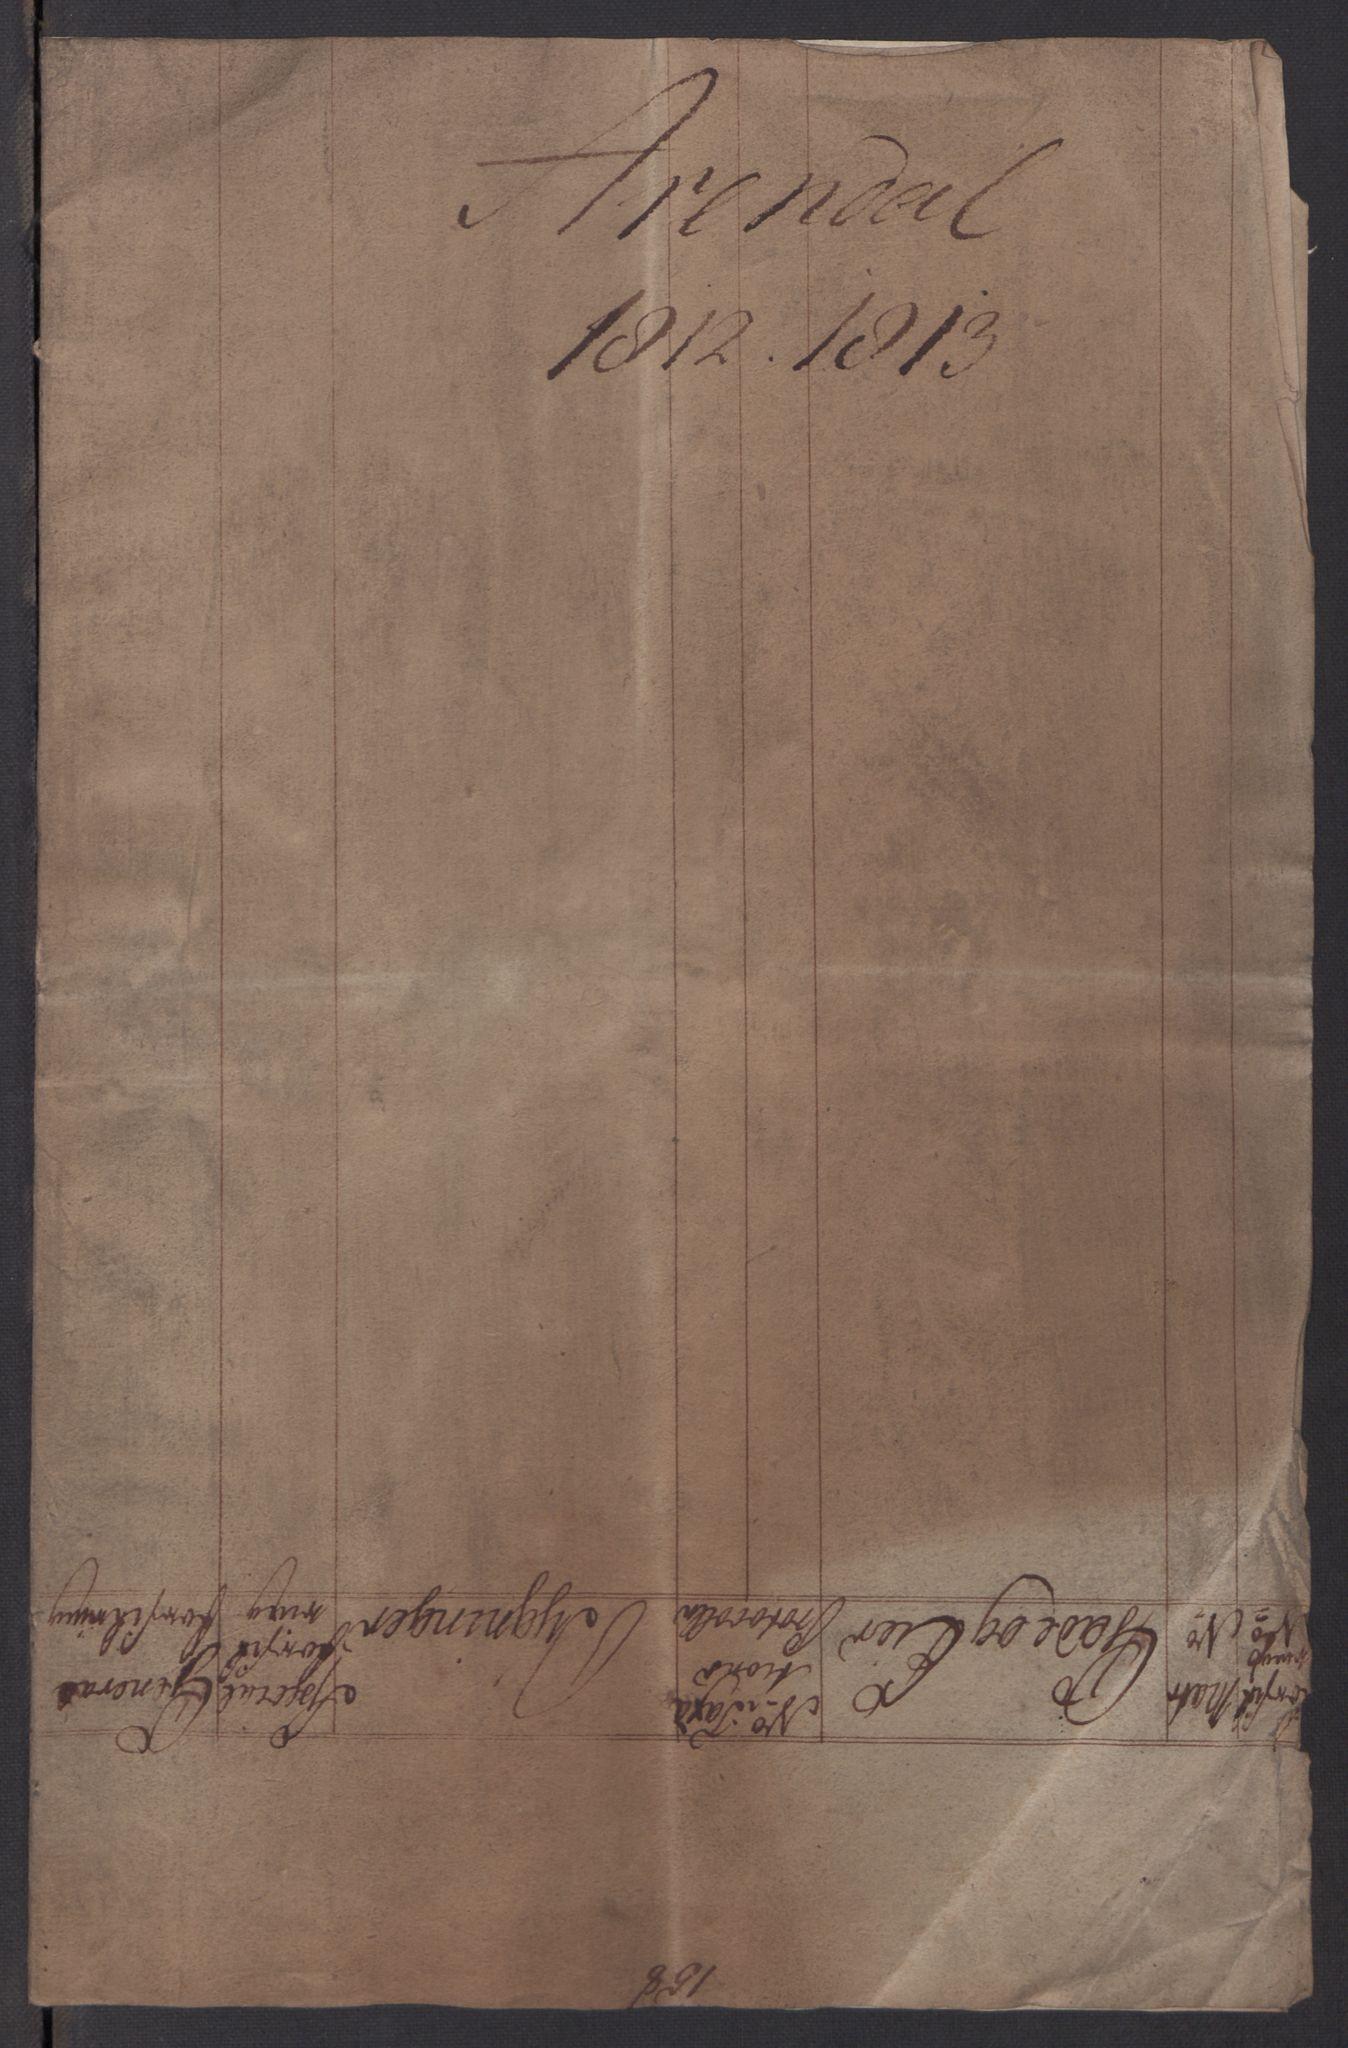 RA, Kommersekollegiet, Brannforsikringskontoret 1767-1814, F/Fa/L0003: Arendal, 1808-1813